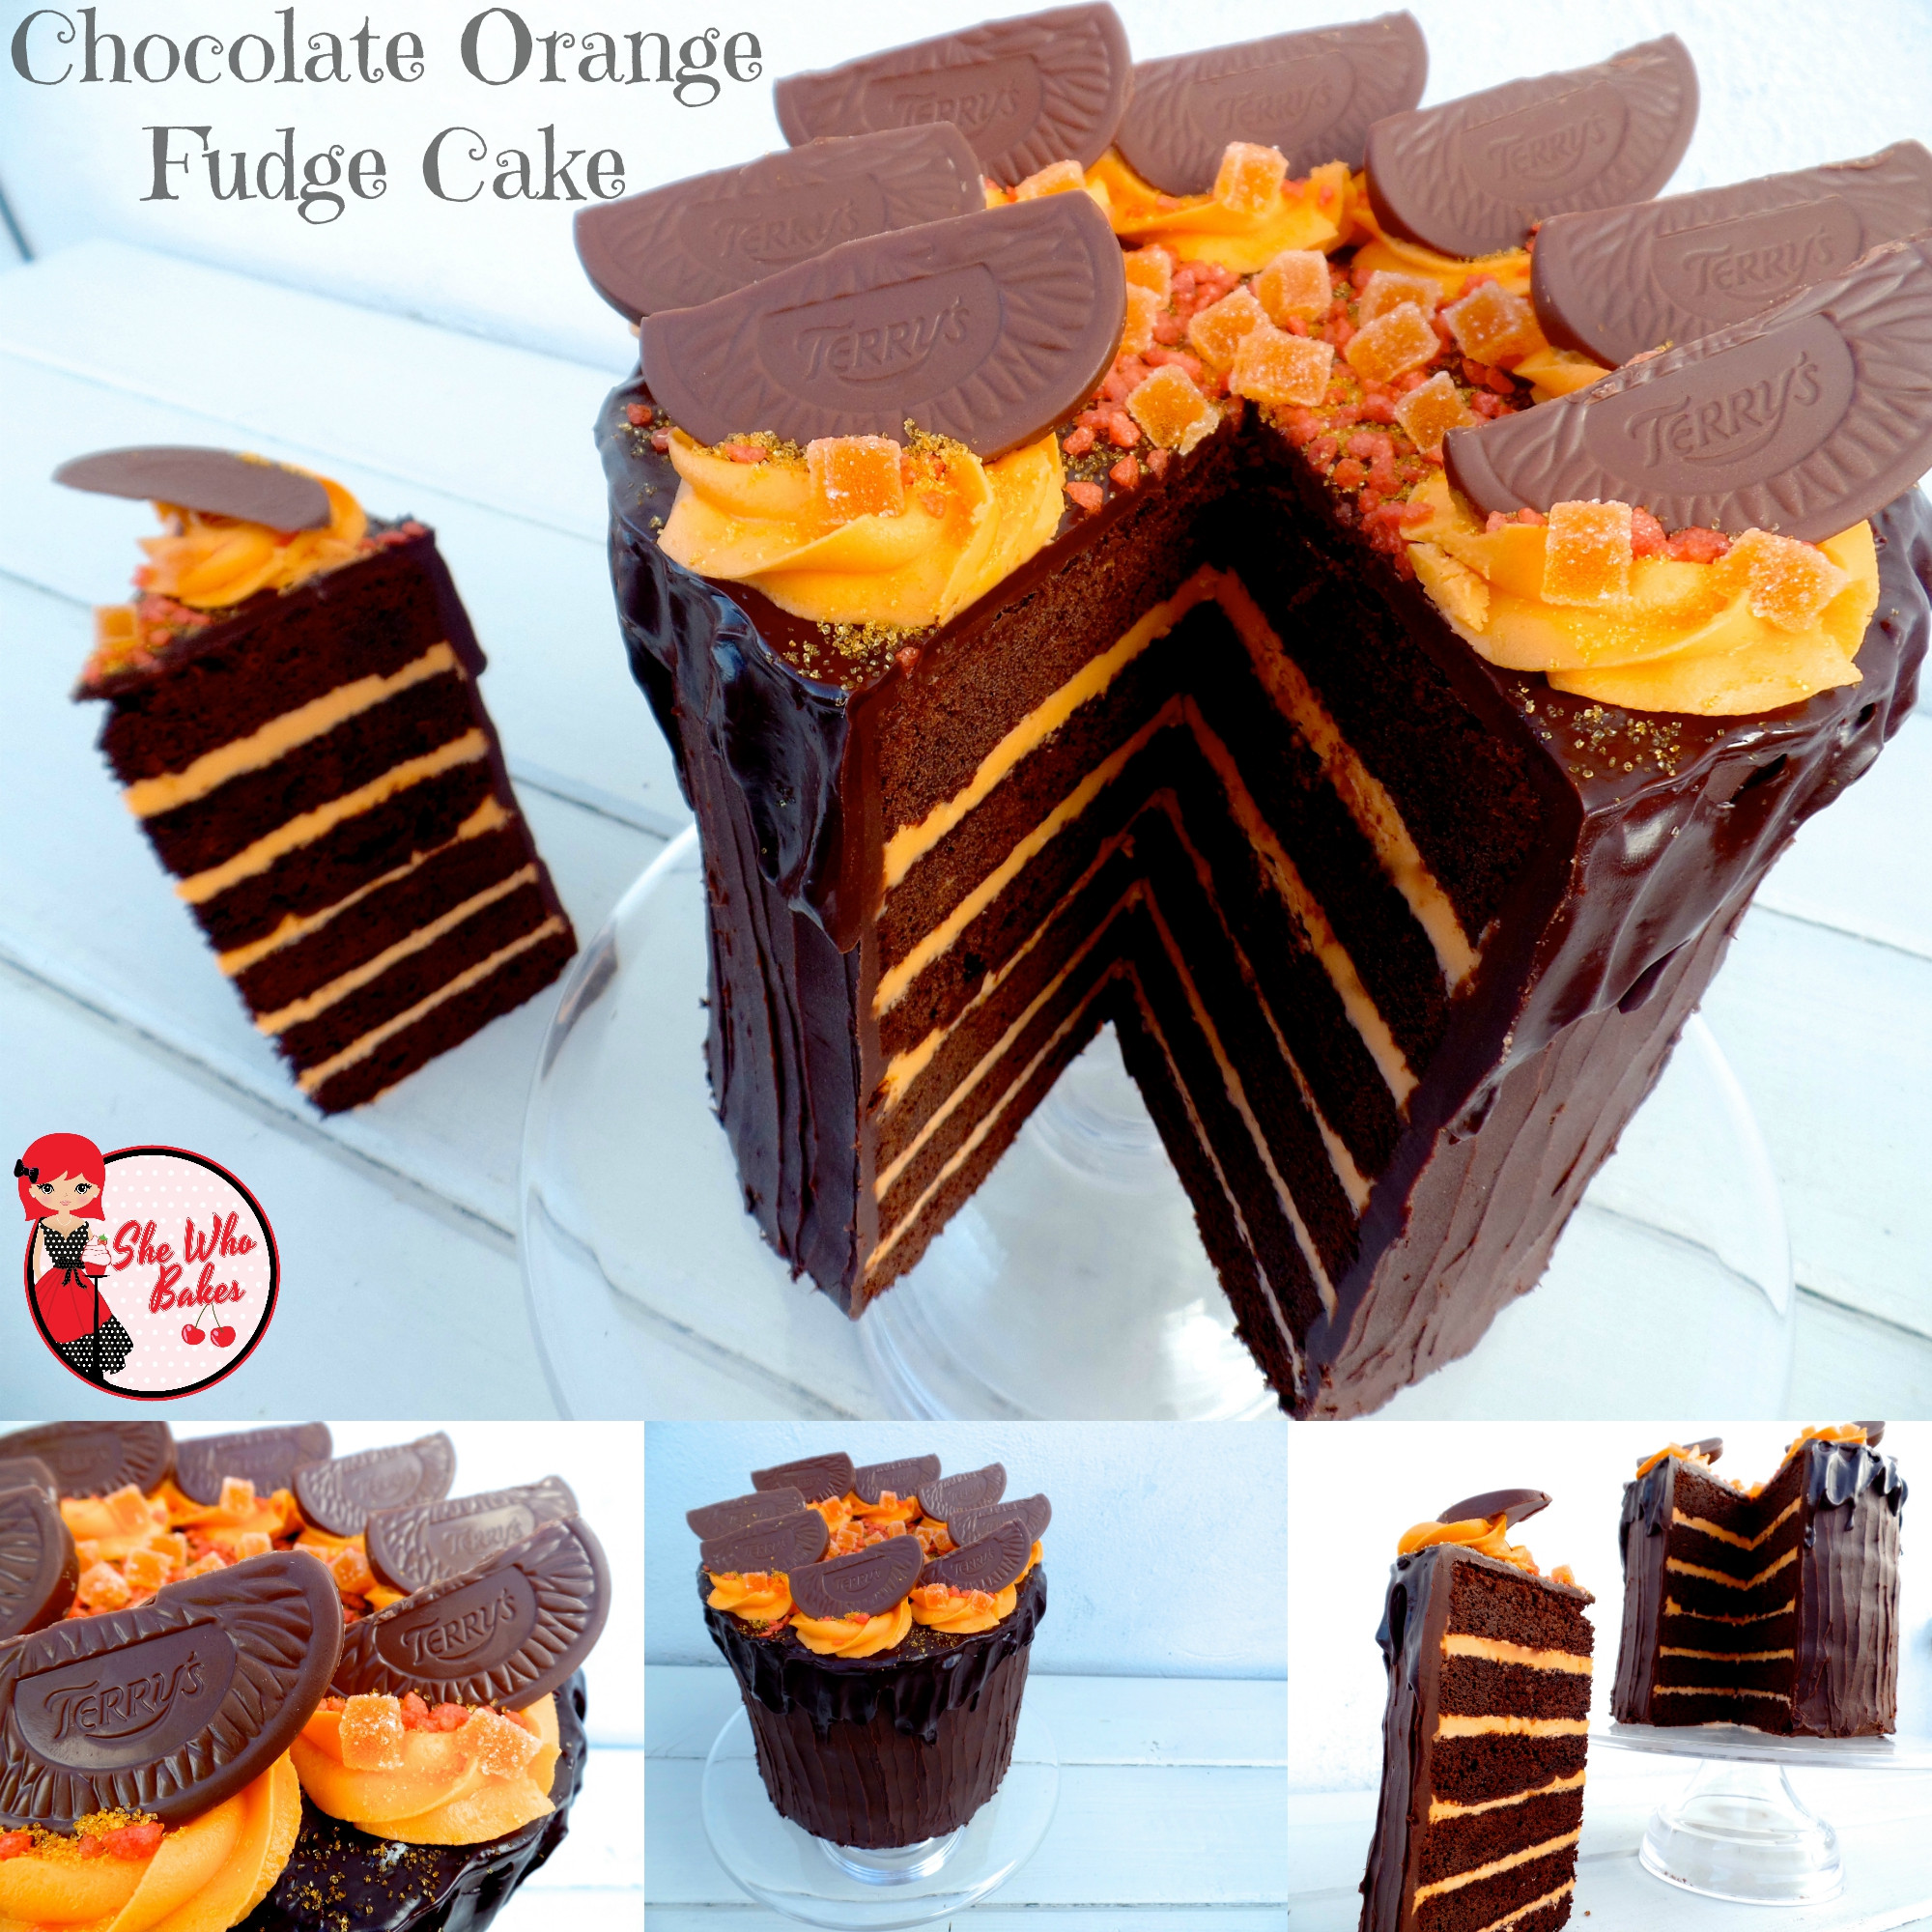 Orange Chocolate Cake  Chocolate Orange Fudge Cake Cake It To The Max